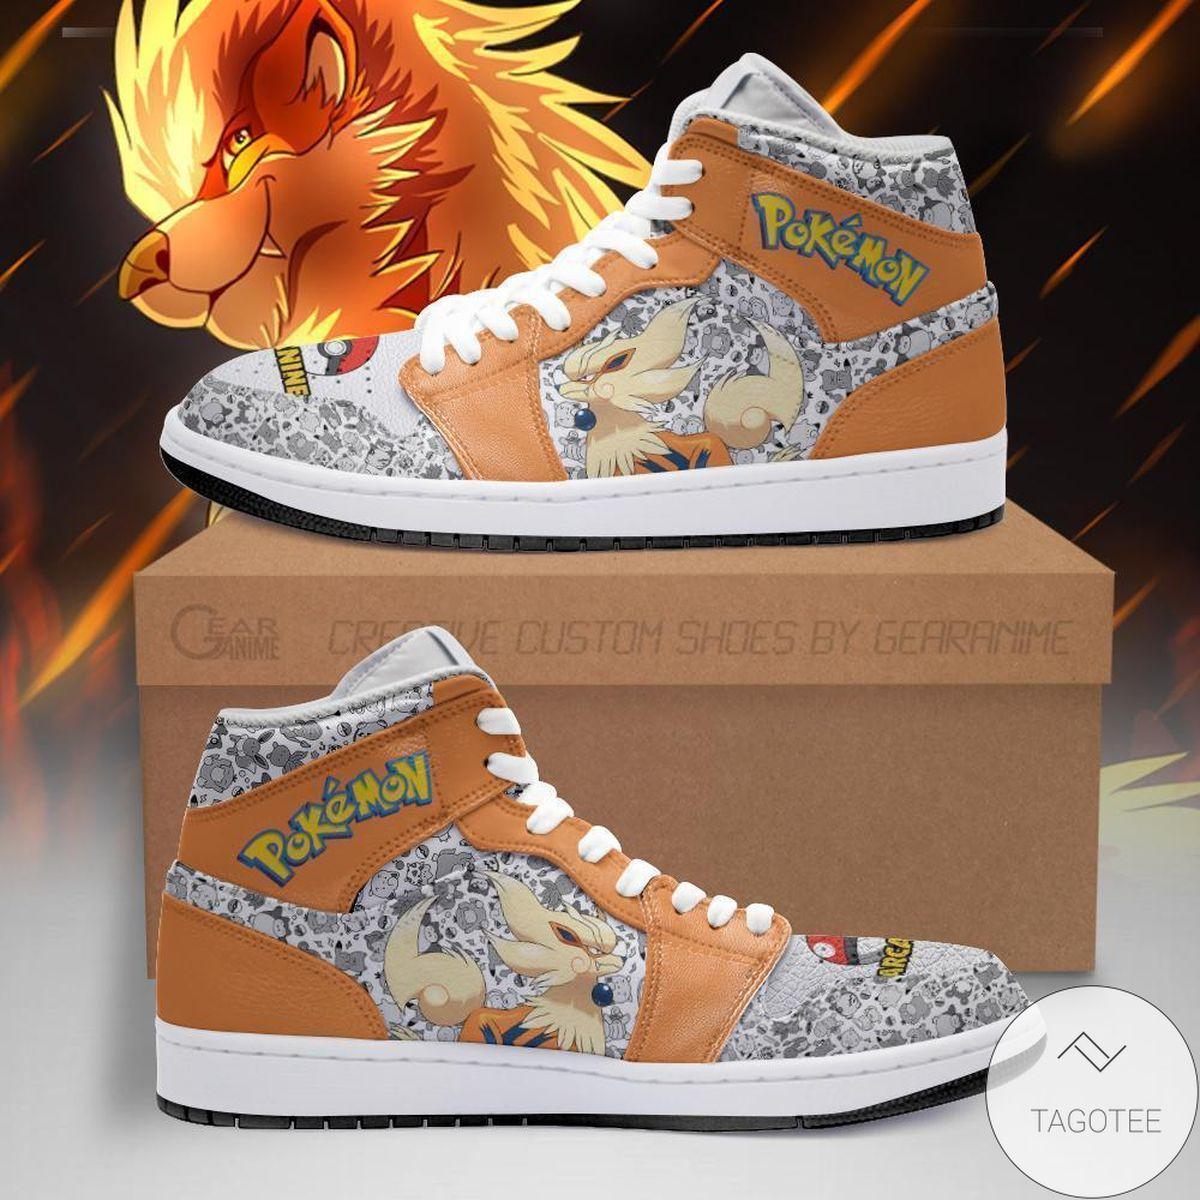 Arcanine Pokemon Air Jordan High Top Shoes